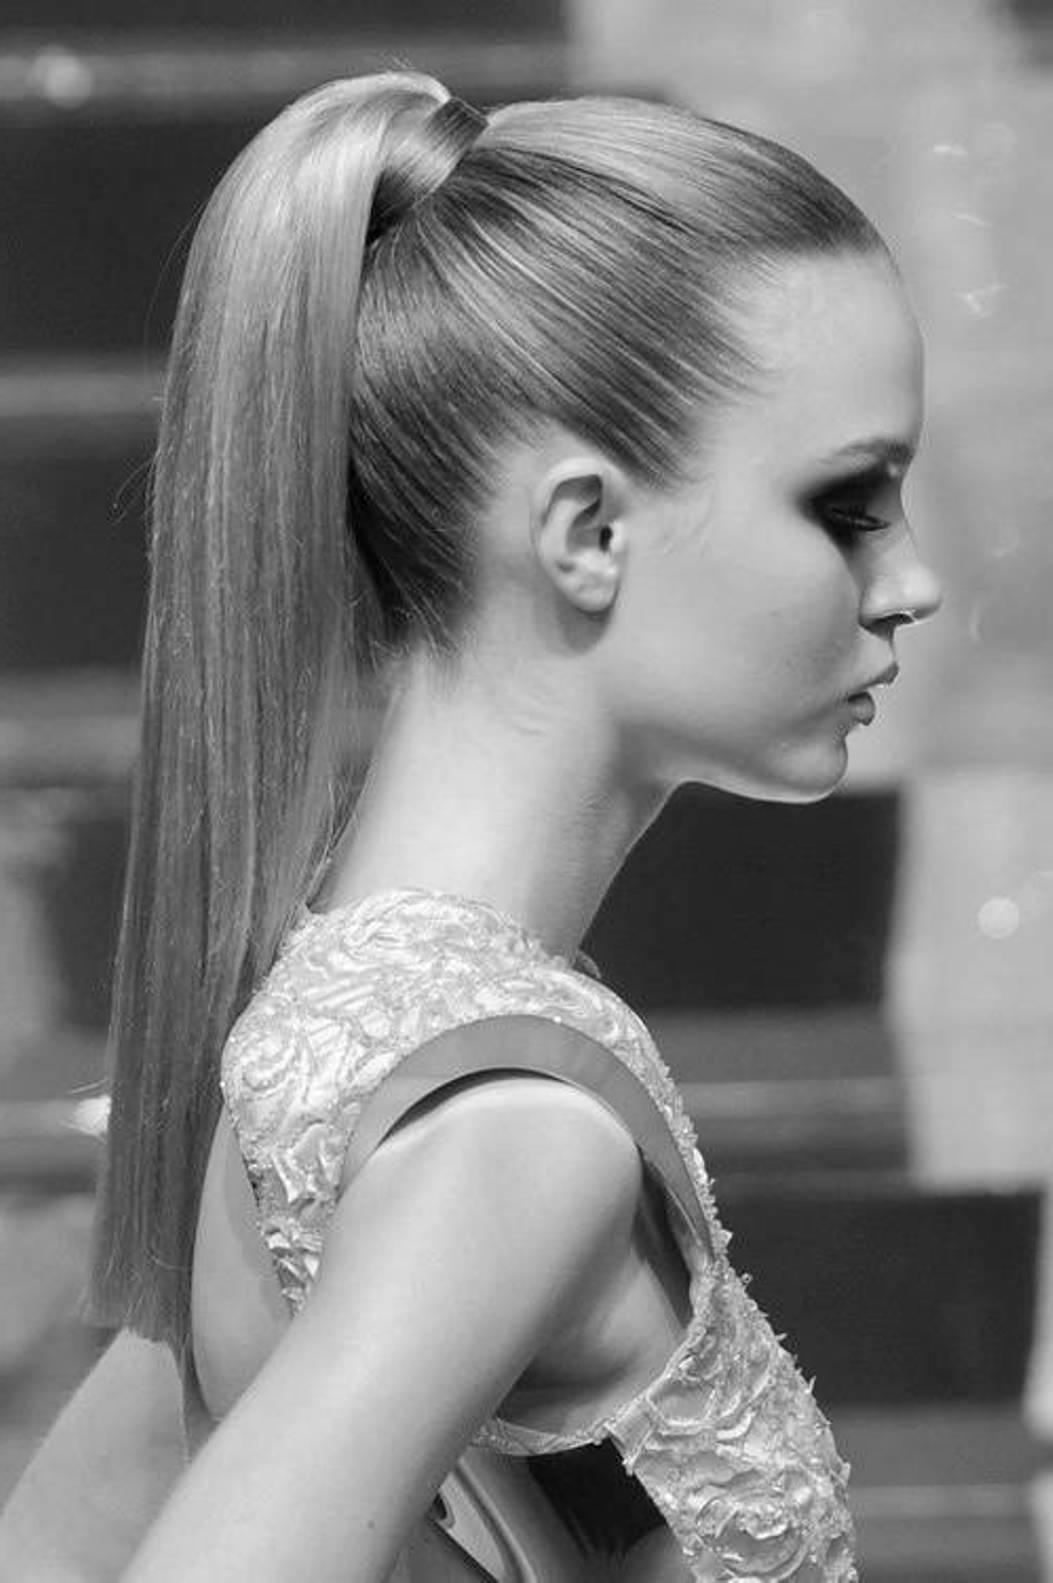 fashion sleek ponytail hairstyle - fmag